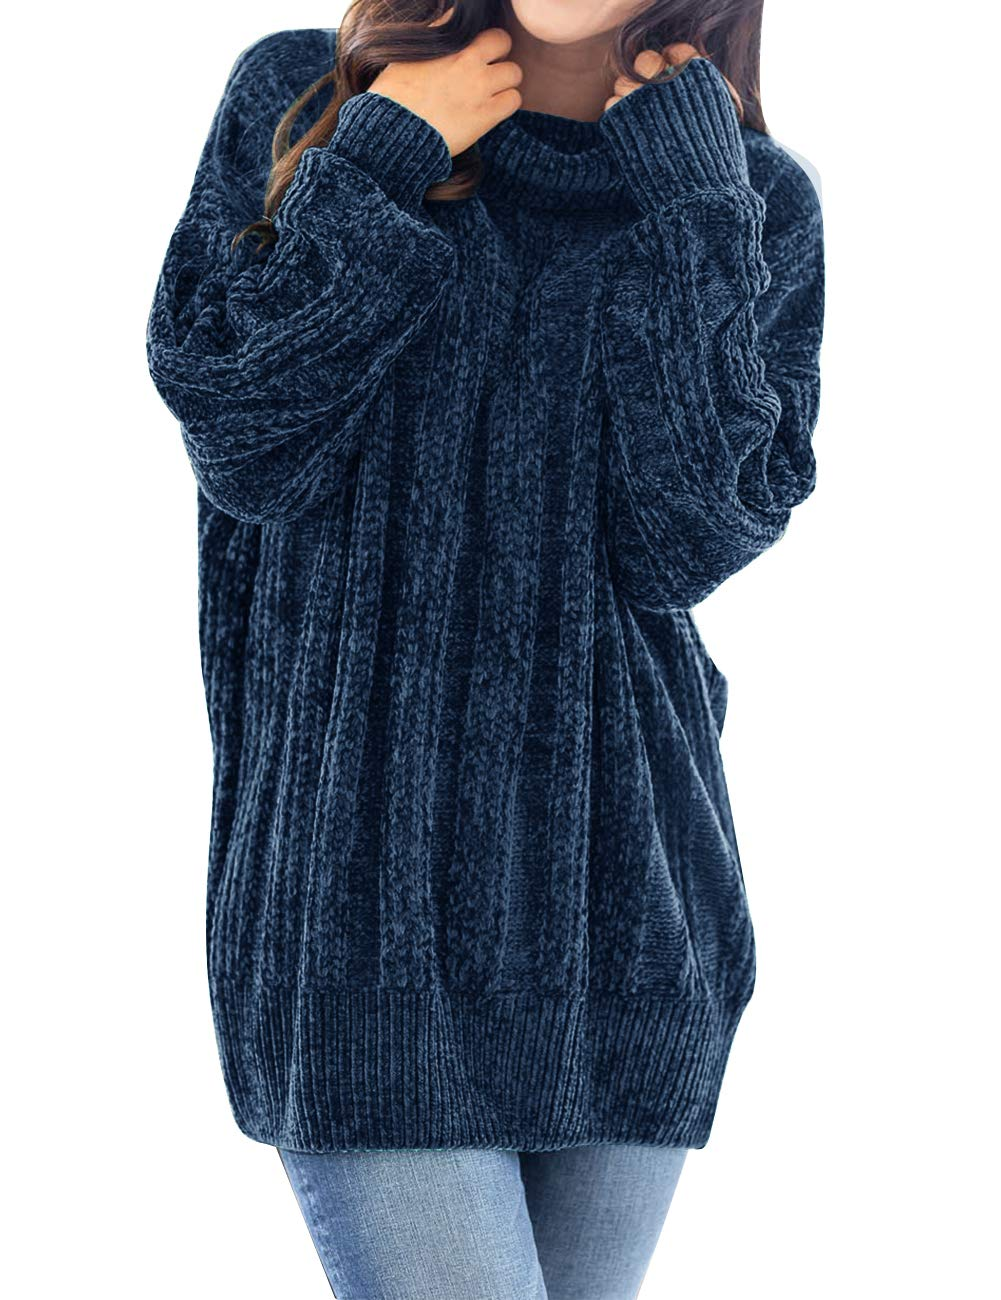 MEROKEETY Women's Long Sleeve Turtleneck Chunky Soft Chenille Velvet Tunic Sweater Pullover Navy by MEROKEETY